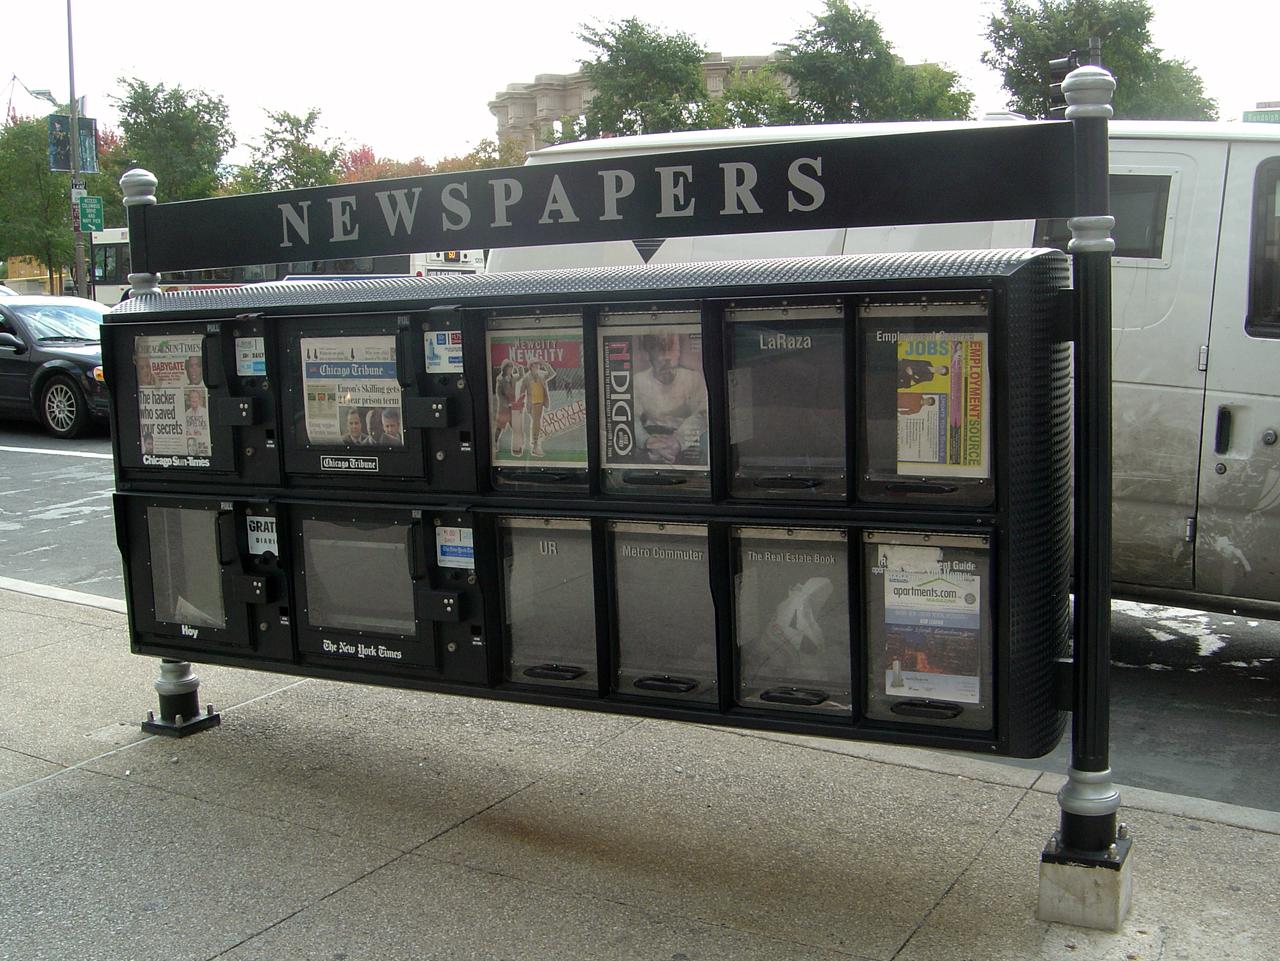 Image of a newspaper vending machine